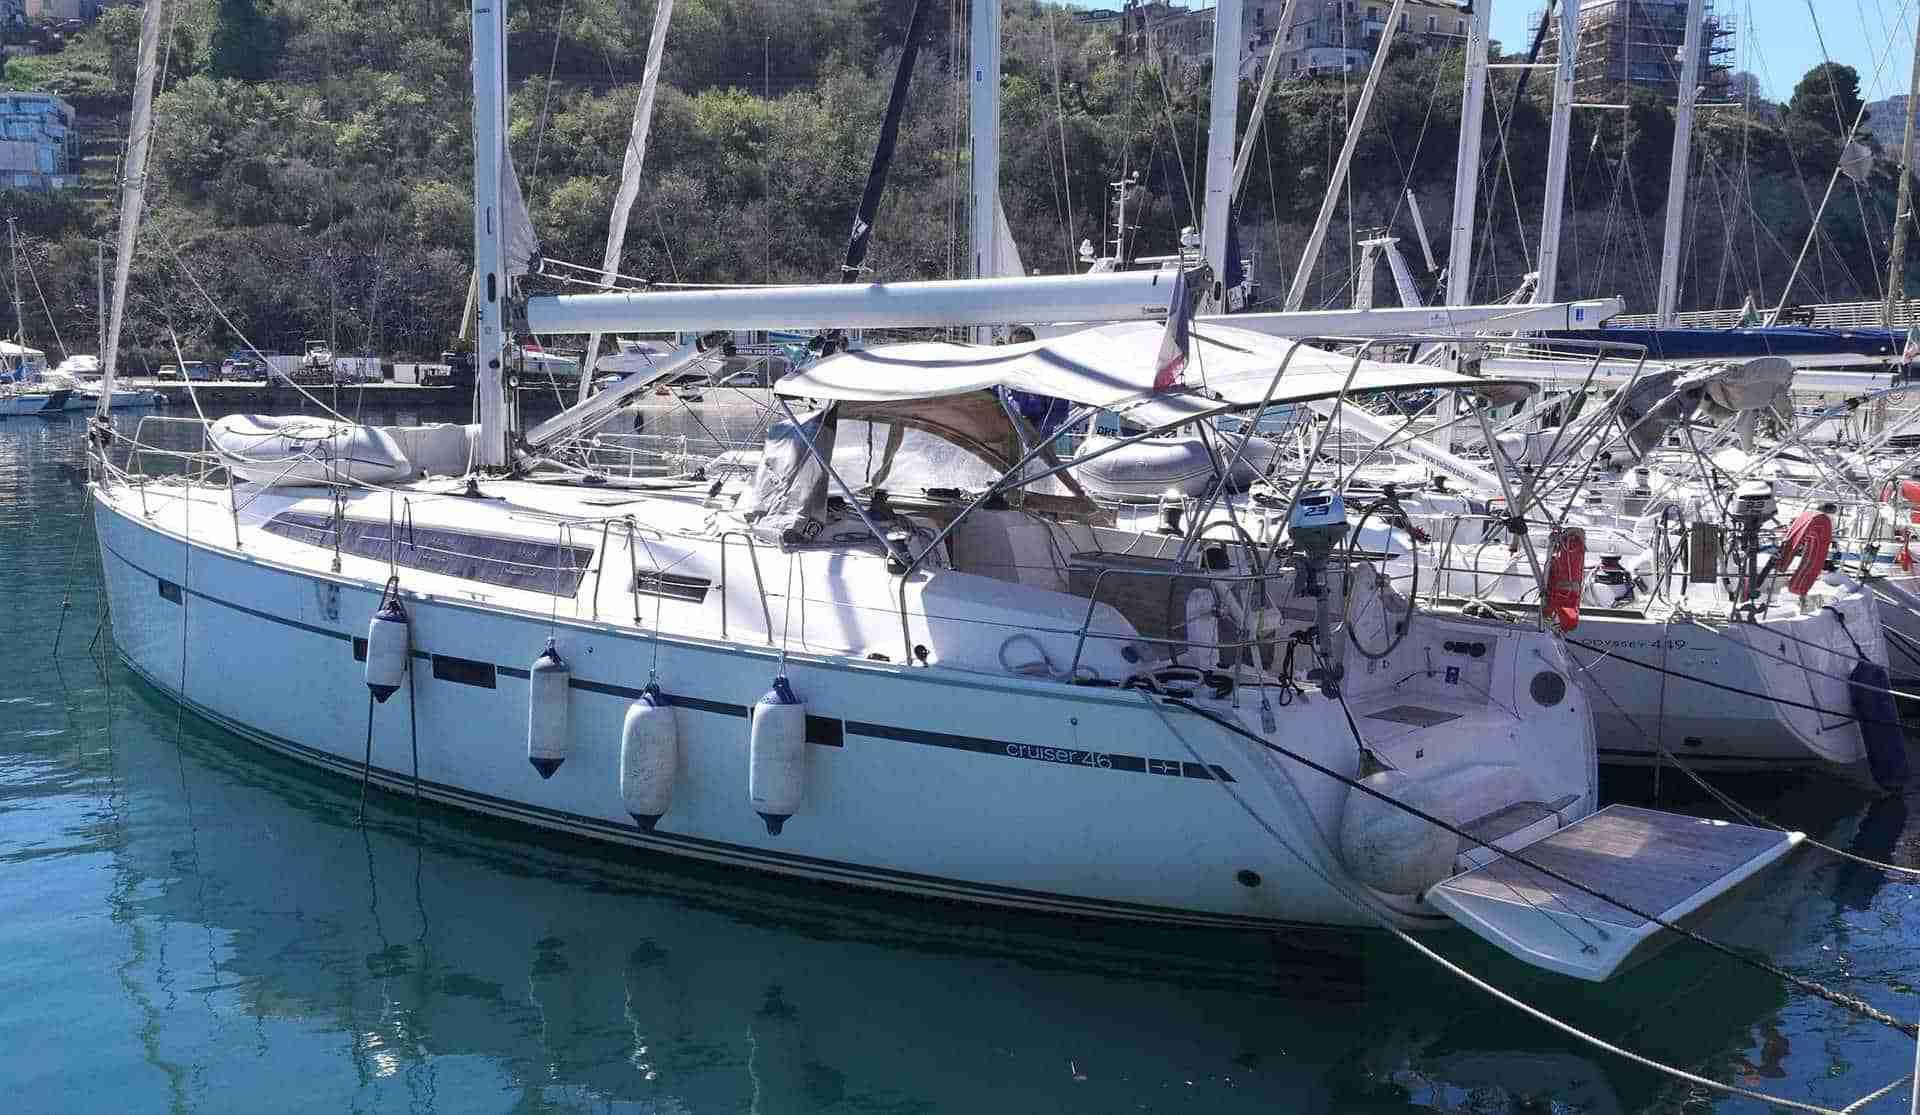 Bavaria 46 - BLUE MOON | Flotta di Vela Dream 1